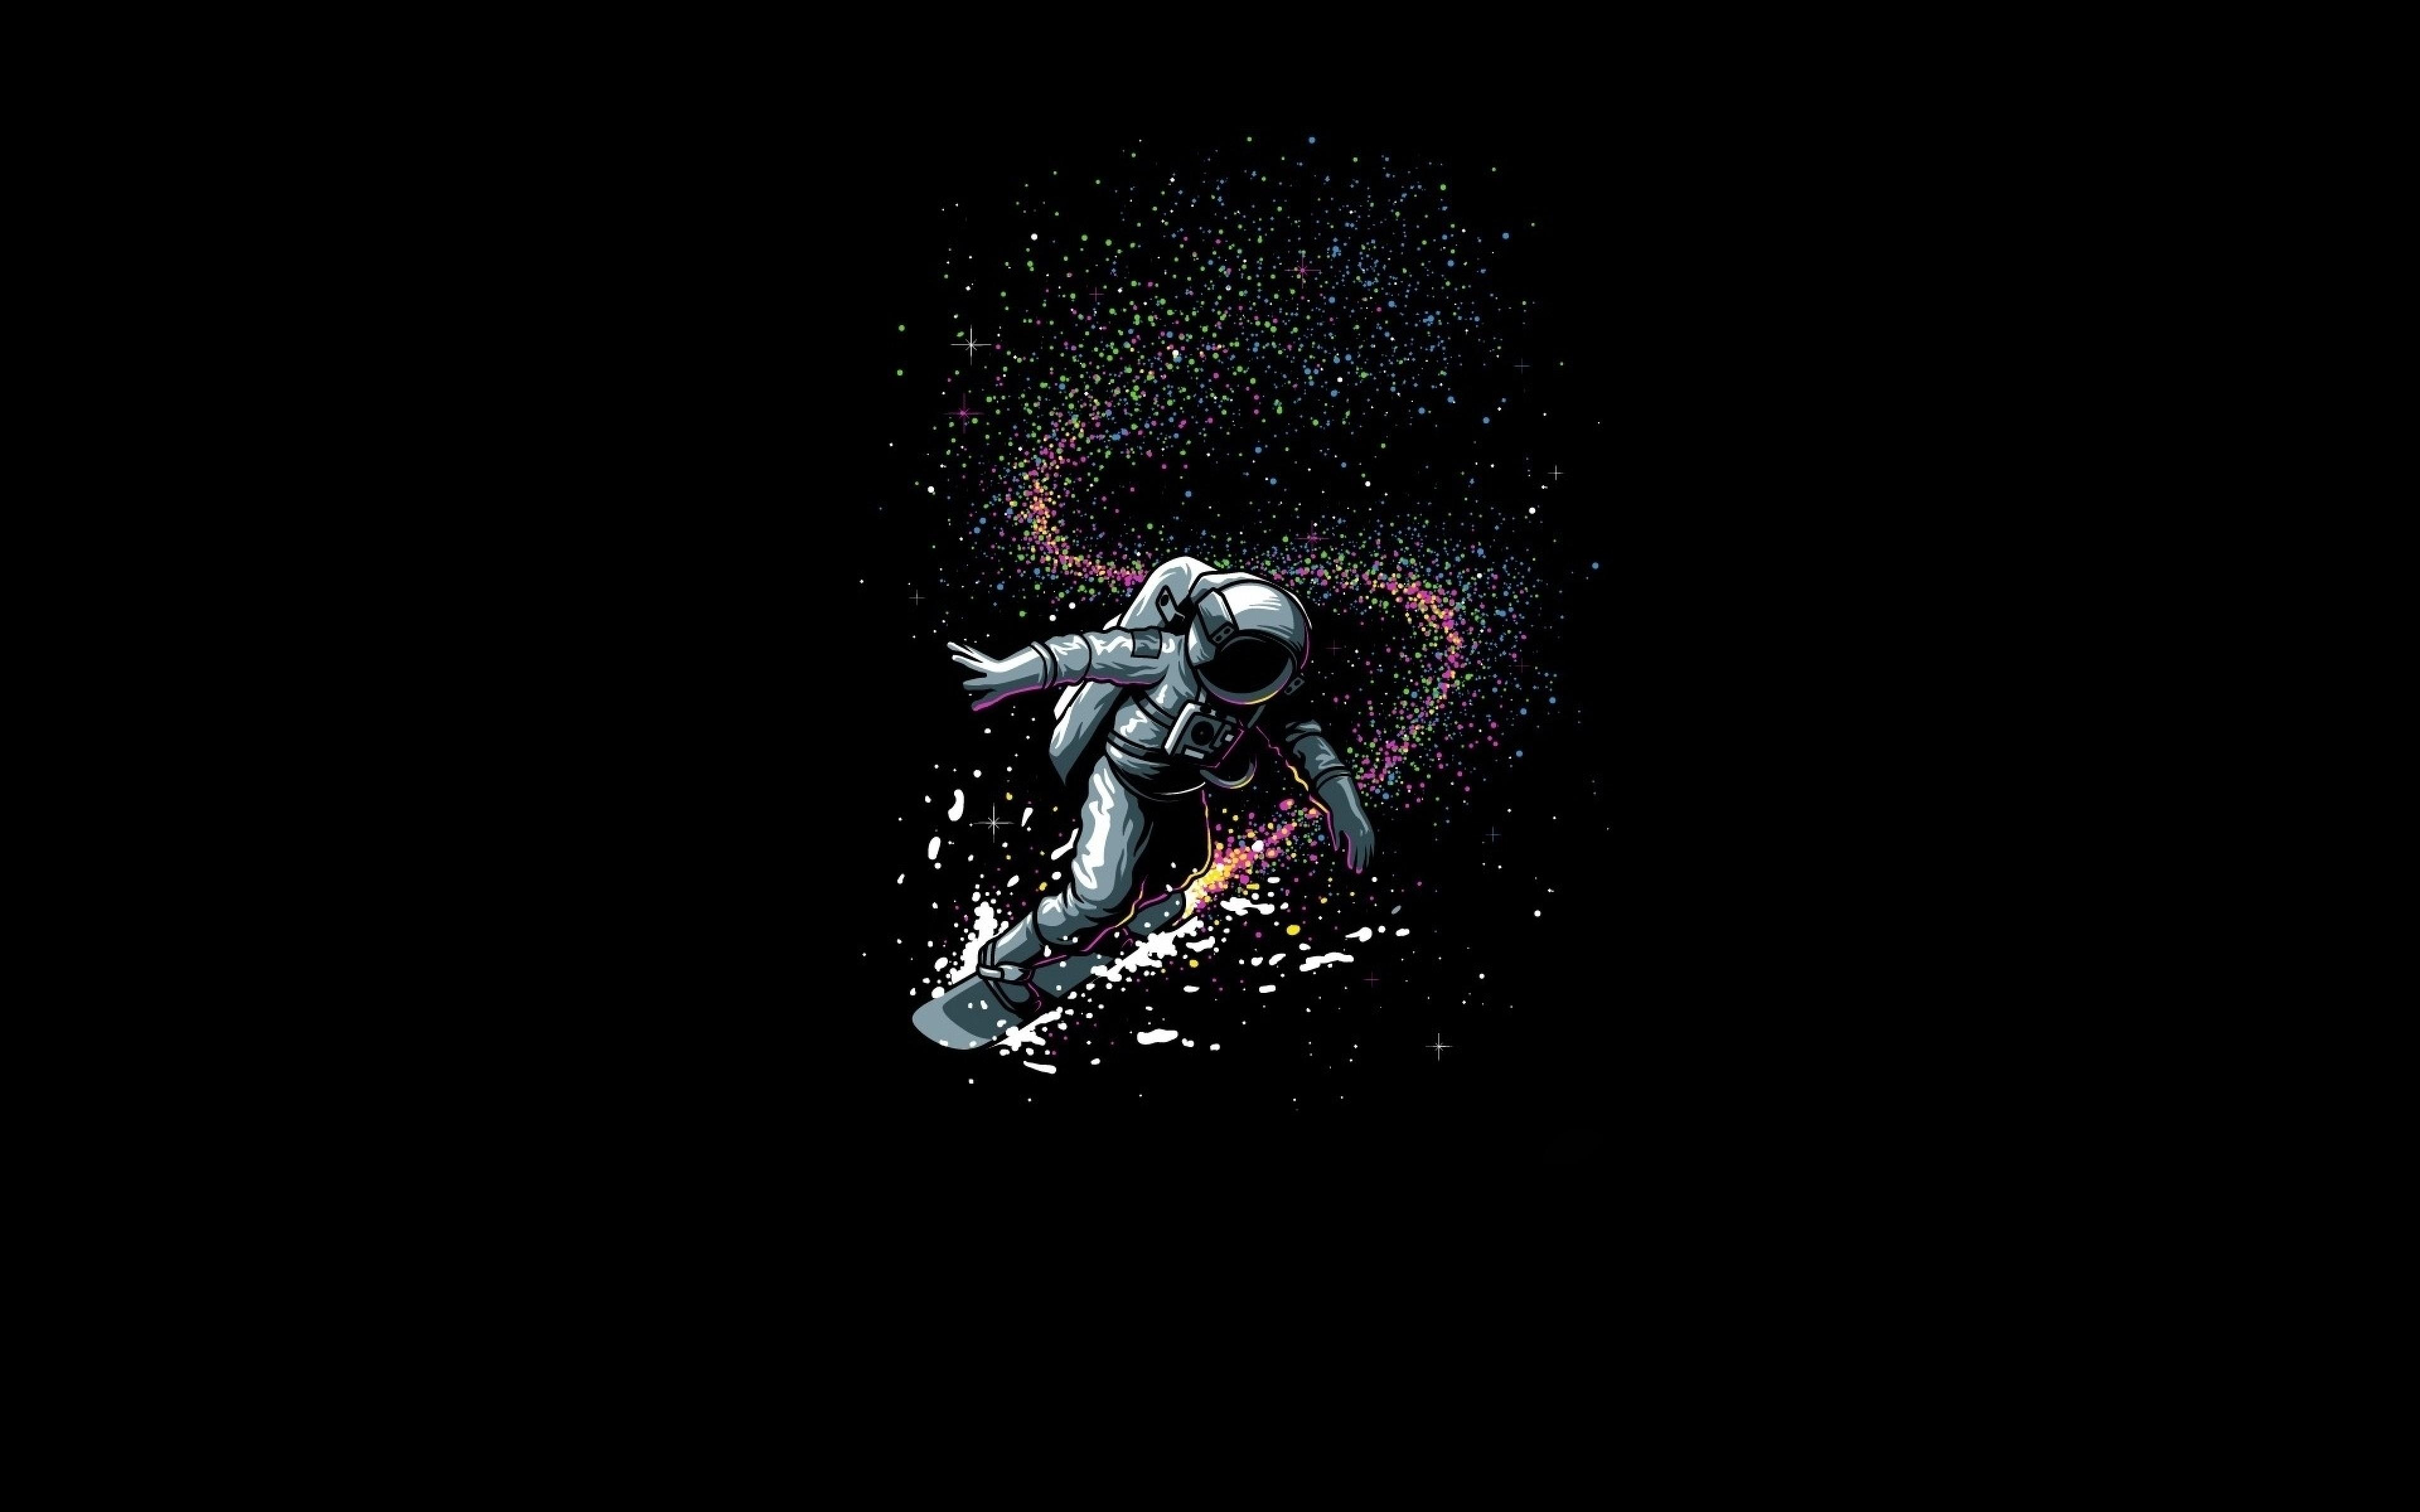 surfing astronaut wallpaper